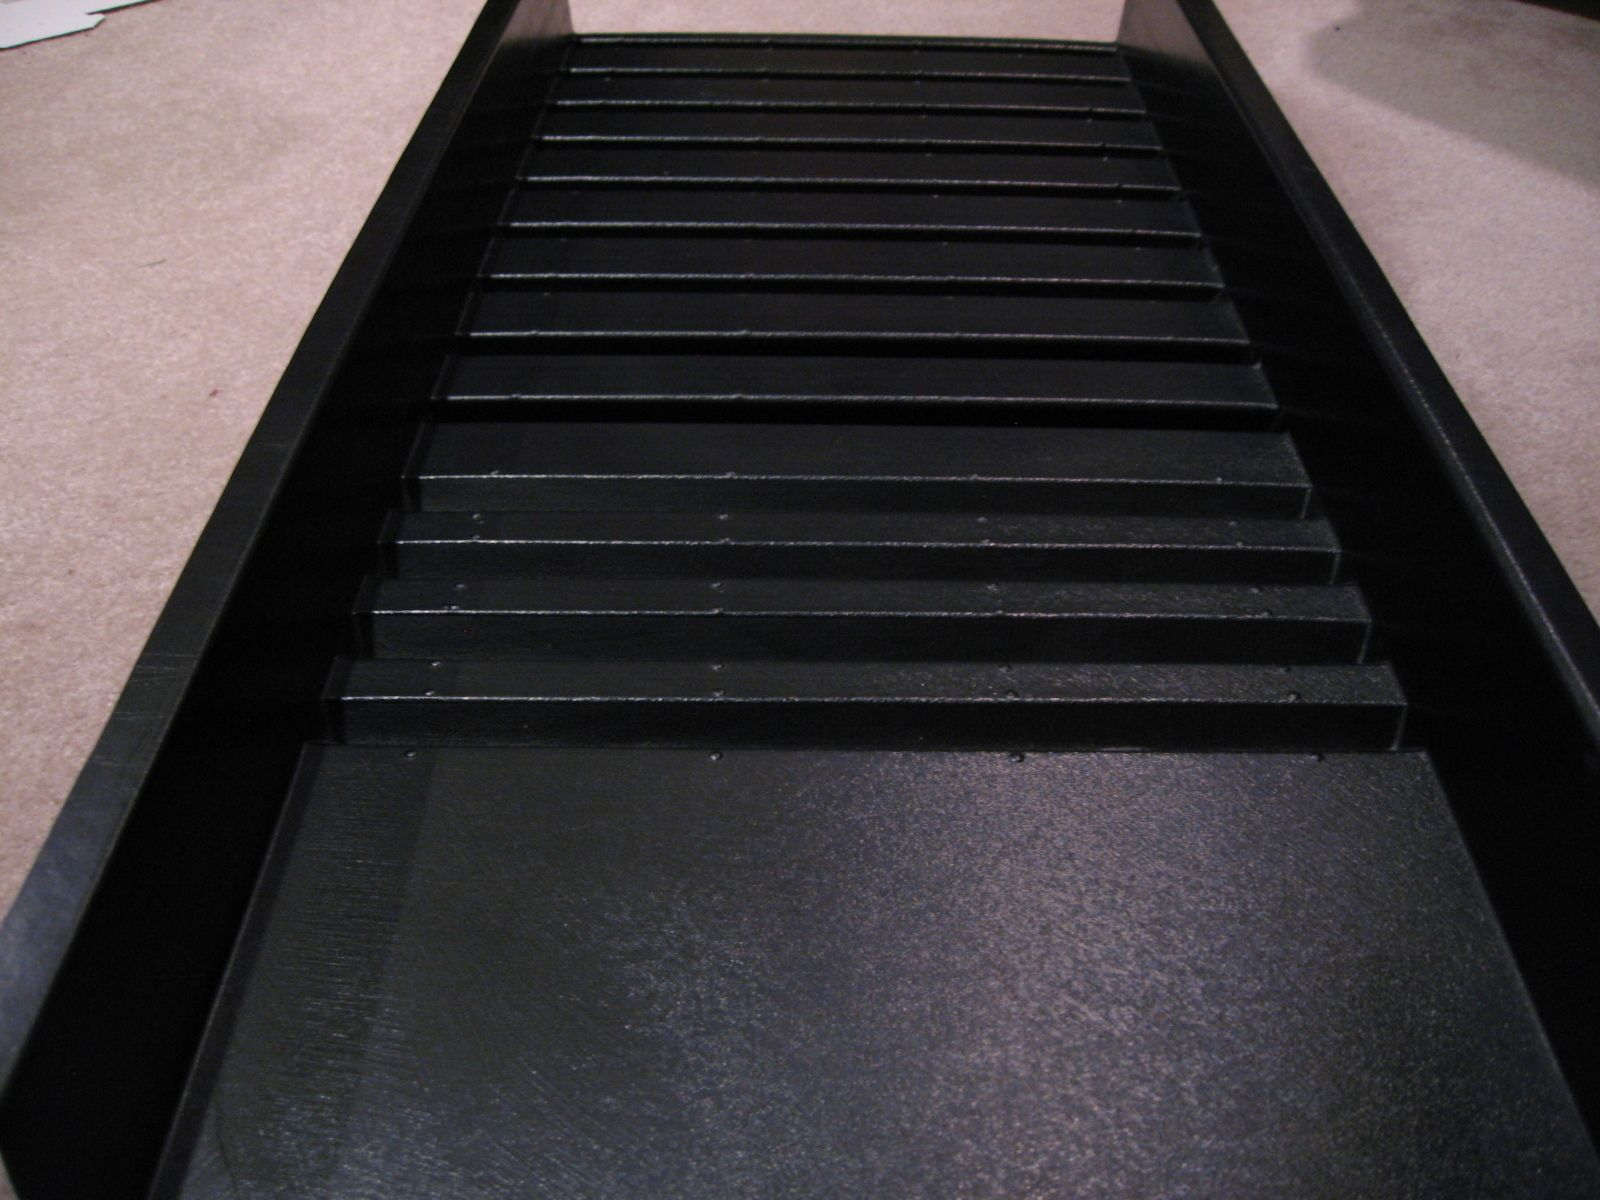 Extra Large Sluice Box 40x16 Deep Drop Riffle Serious Gold Miner Prospector Ebay Gold Prospecting Gold Mining Metal Detector